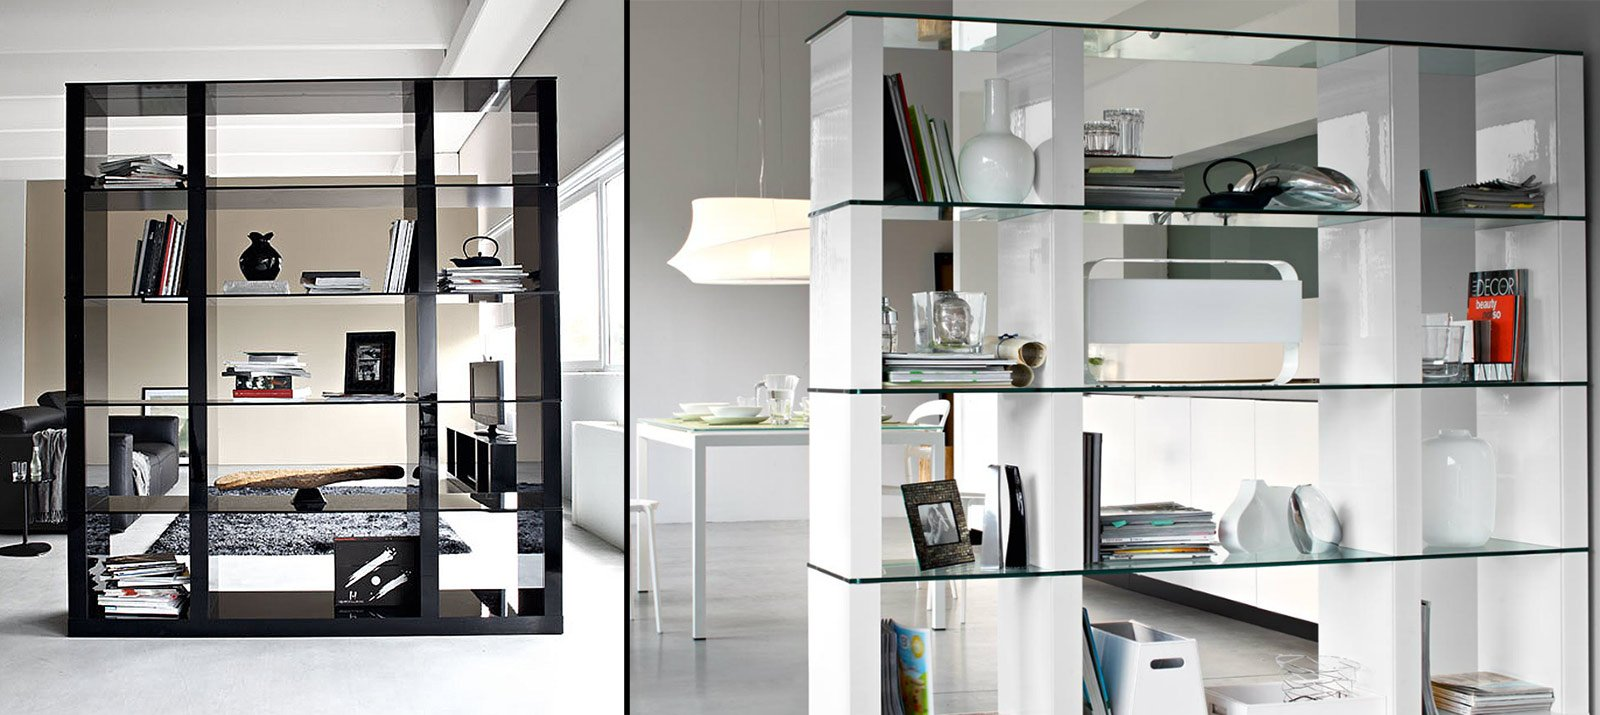 Top Librerie bifacciali per separare ambienti - Cose di Casa IC57